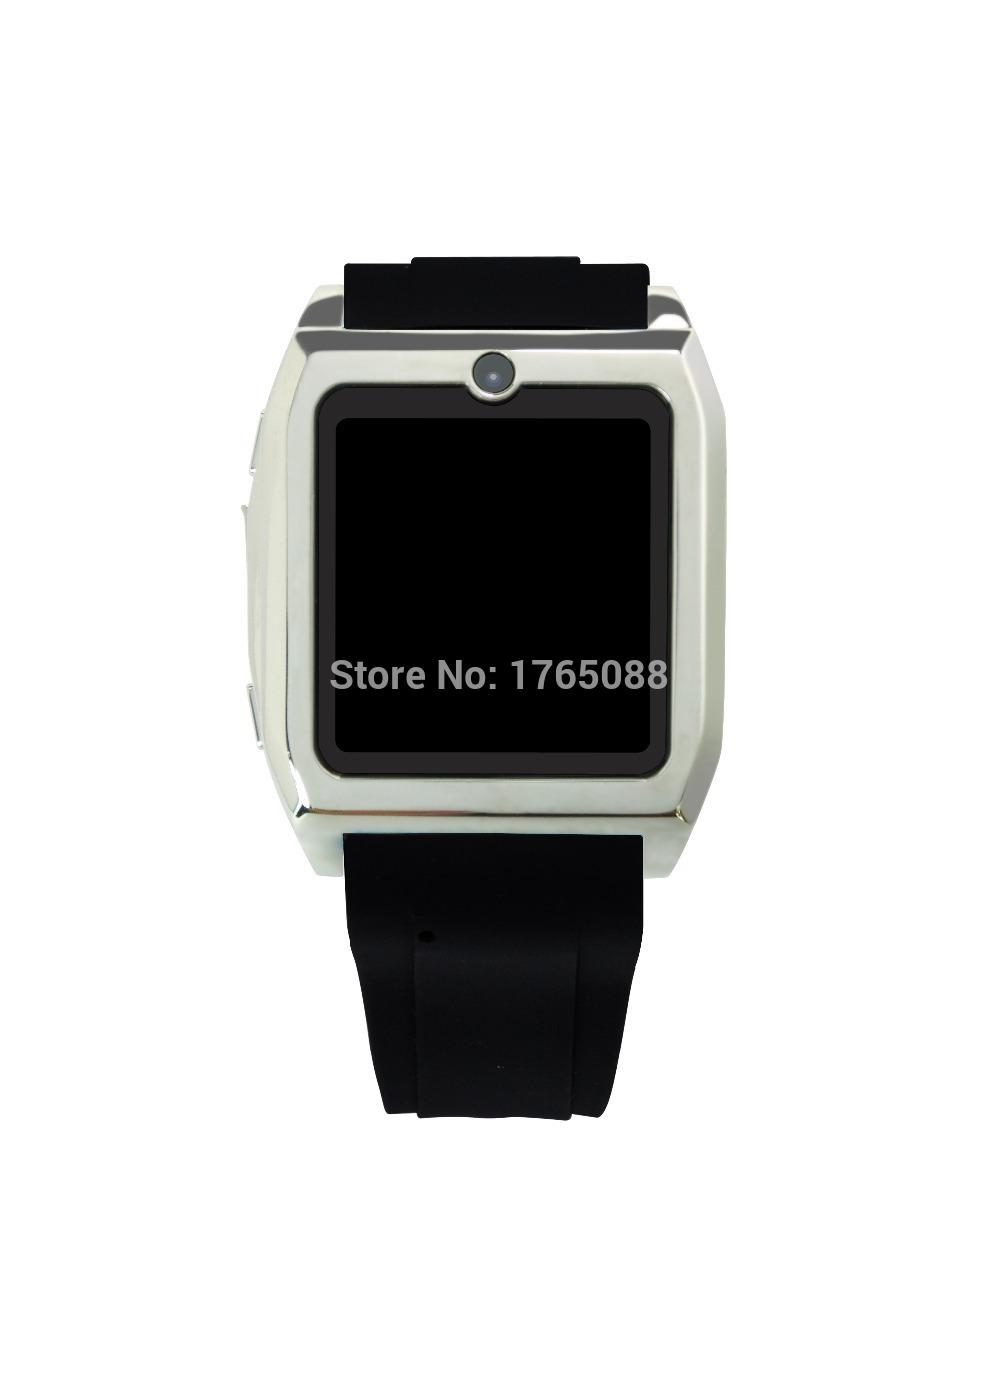 2014 new trendy product cheap watch phone(China (Mainland))